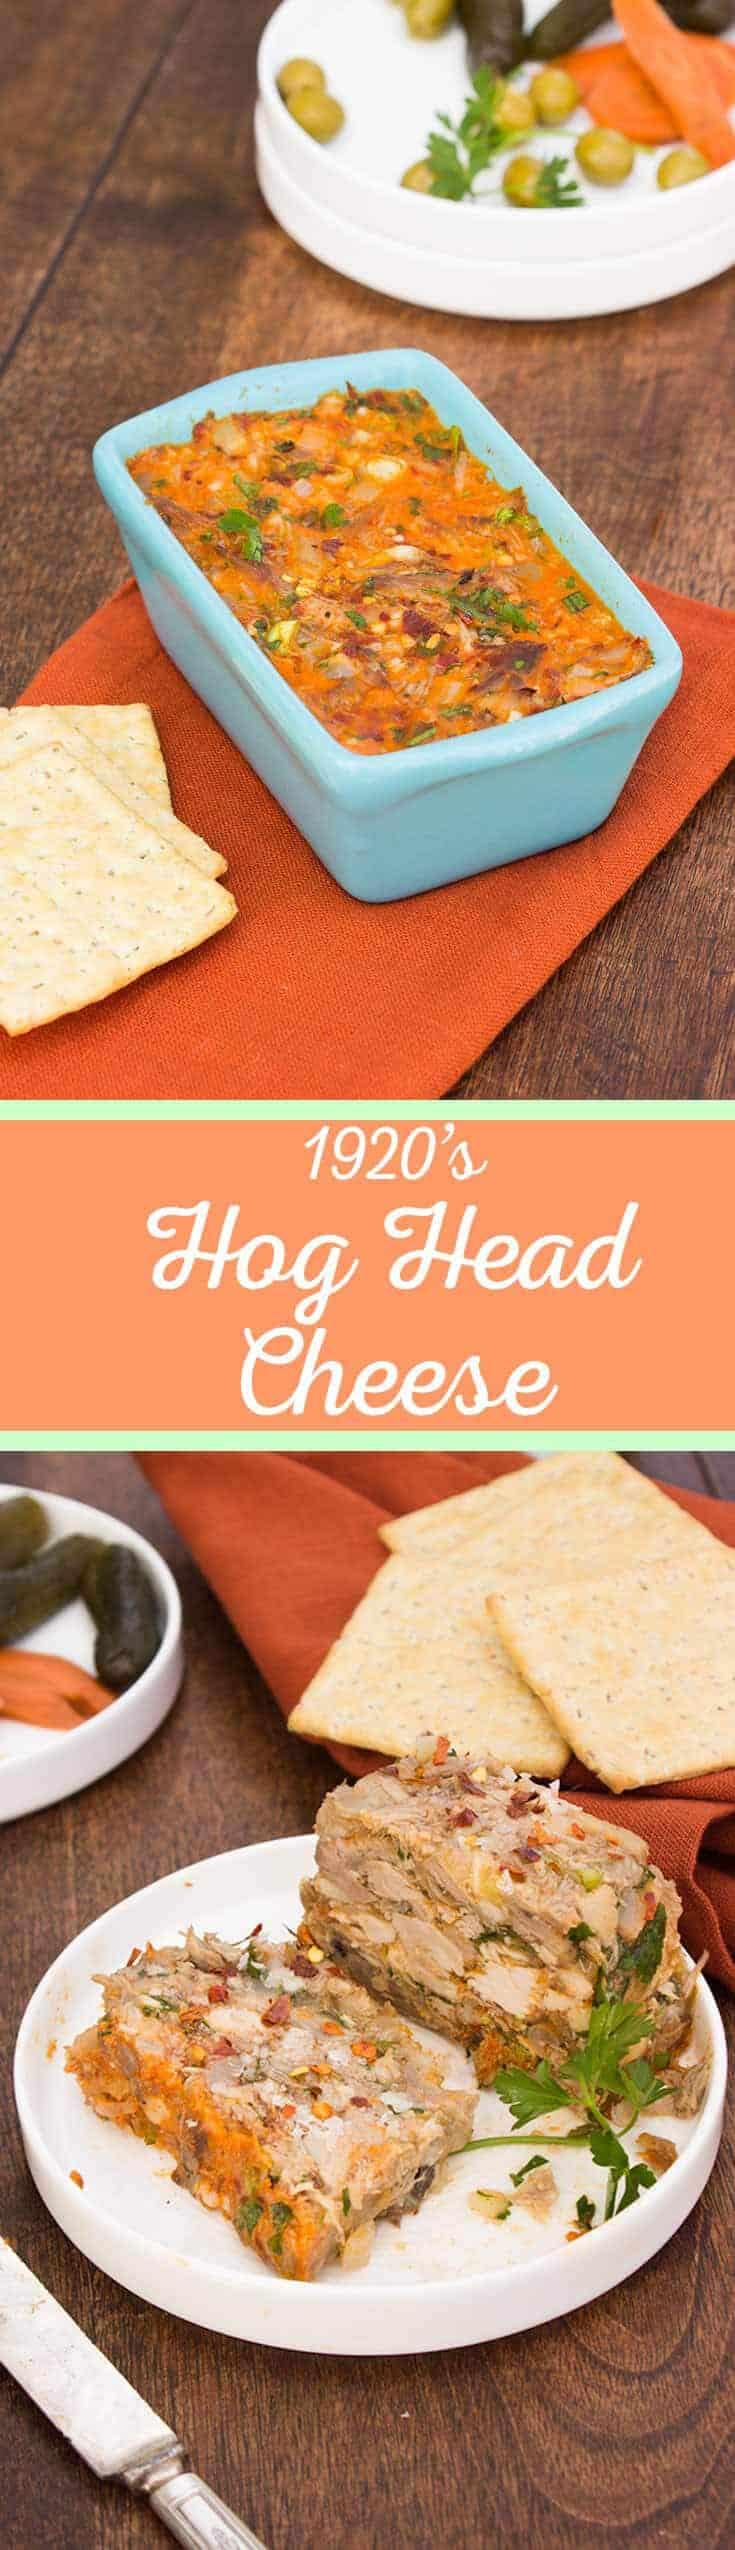 Hog Head Cheese - Long Pin